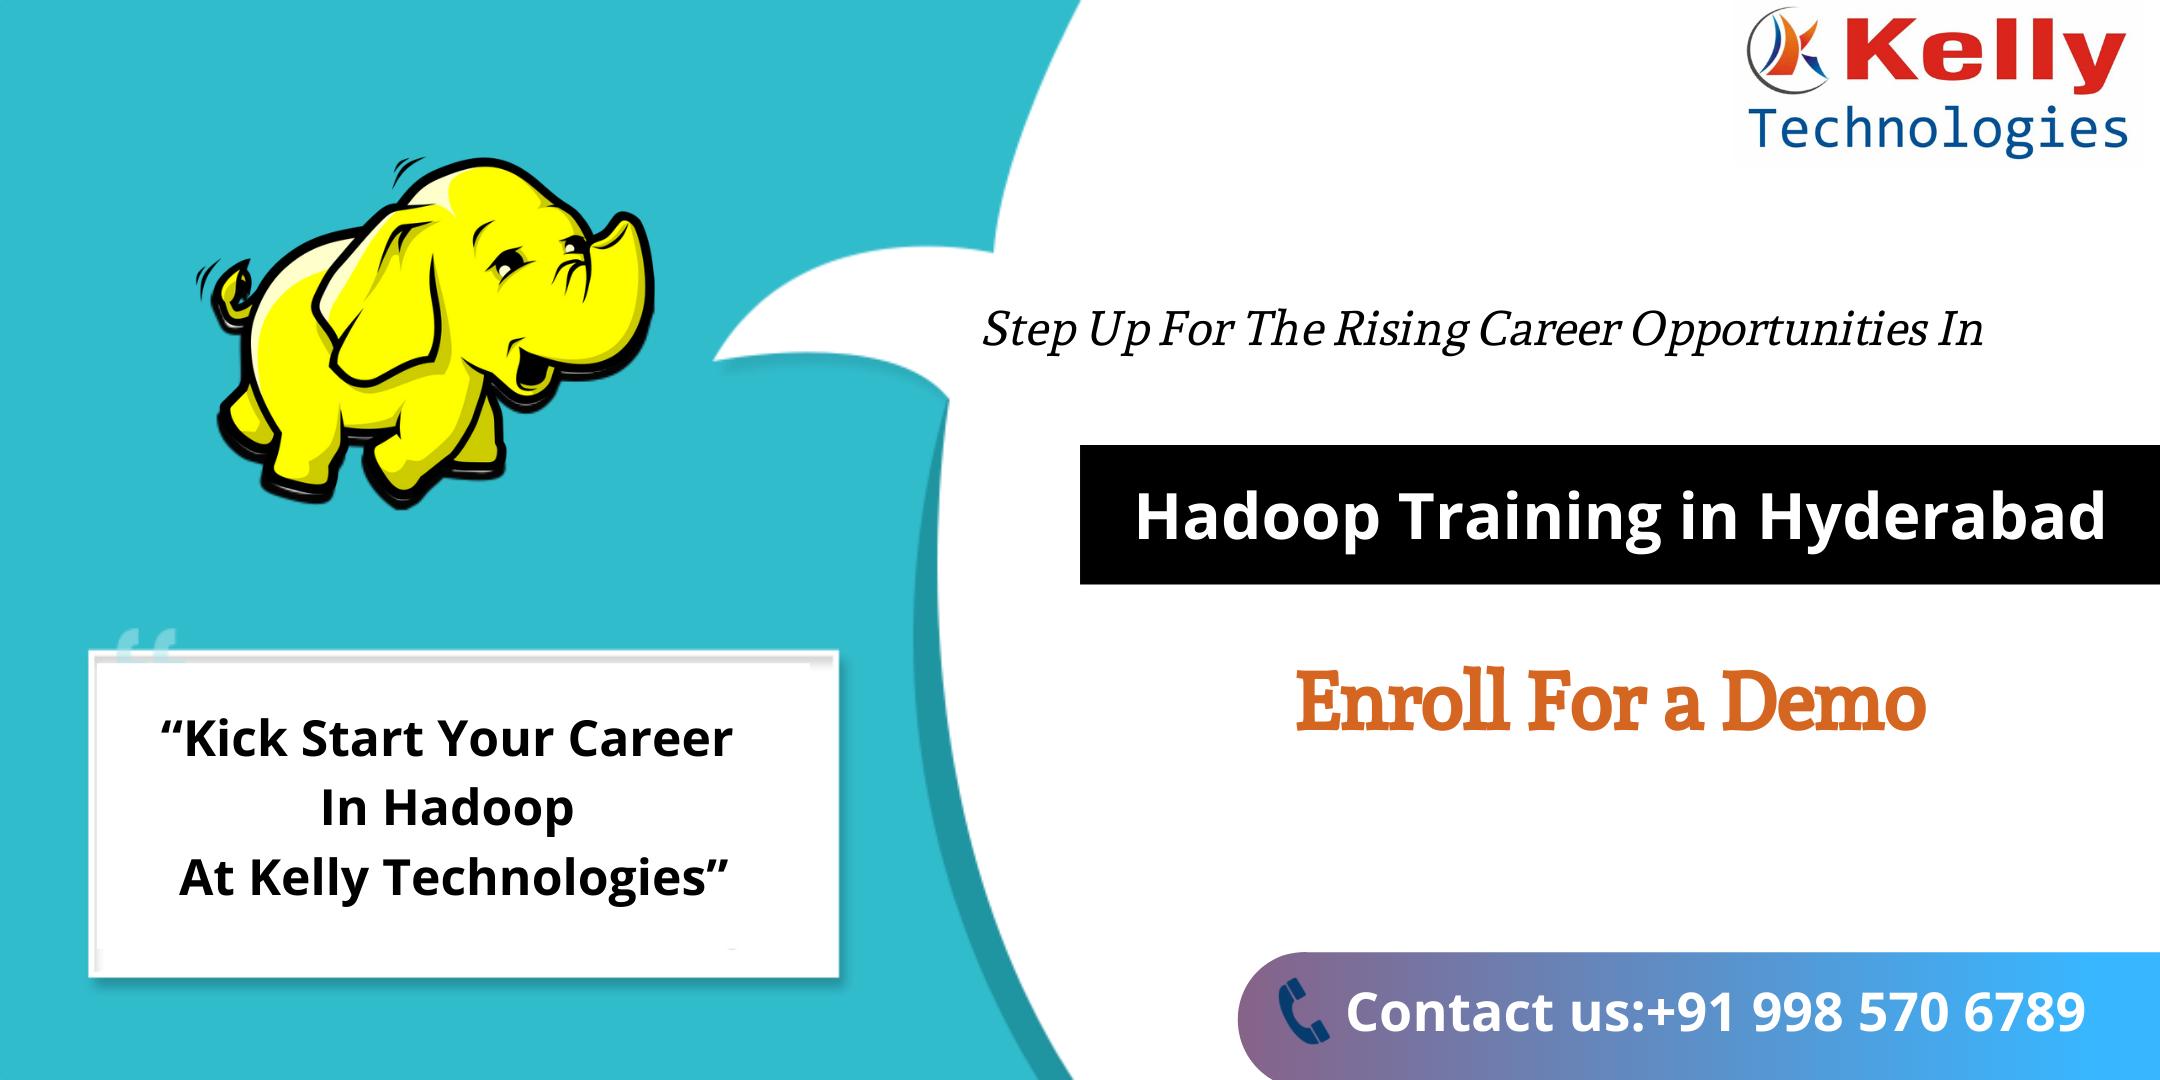 Register for Free High interactive informative Hadoop